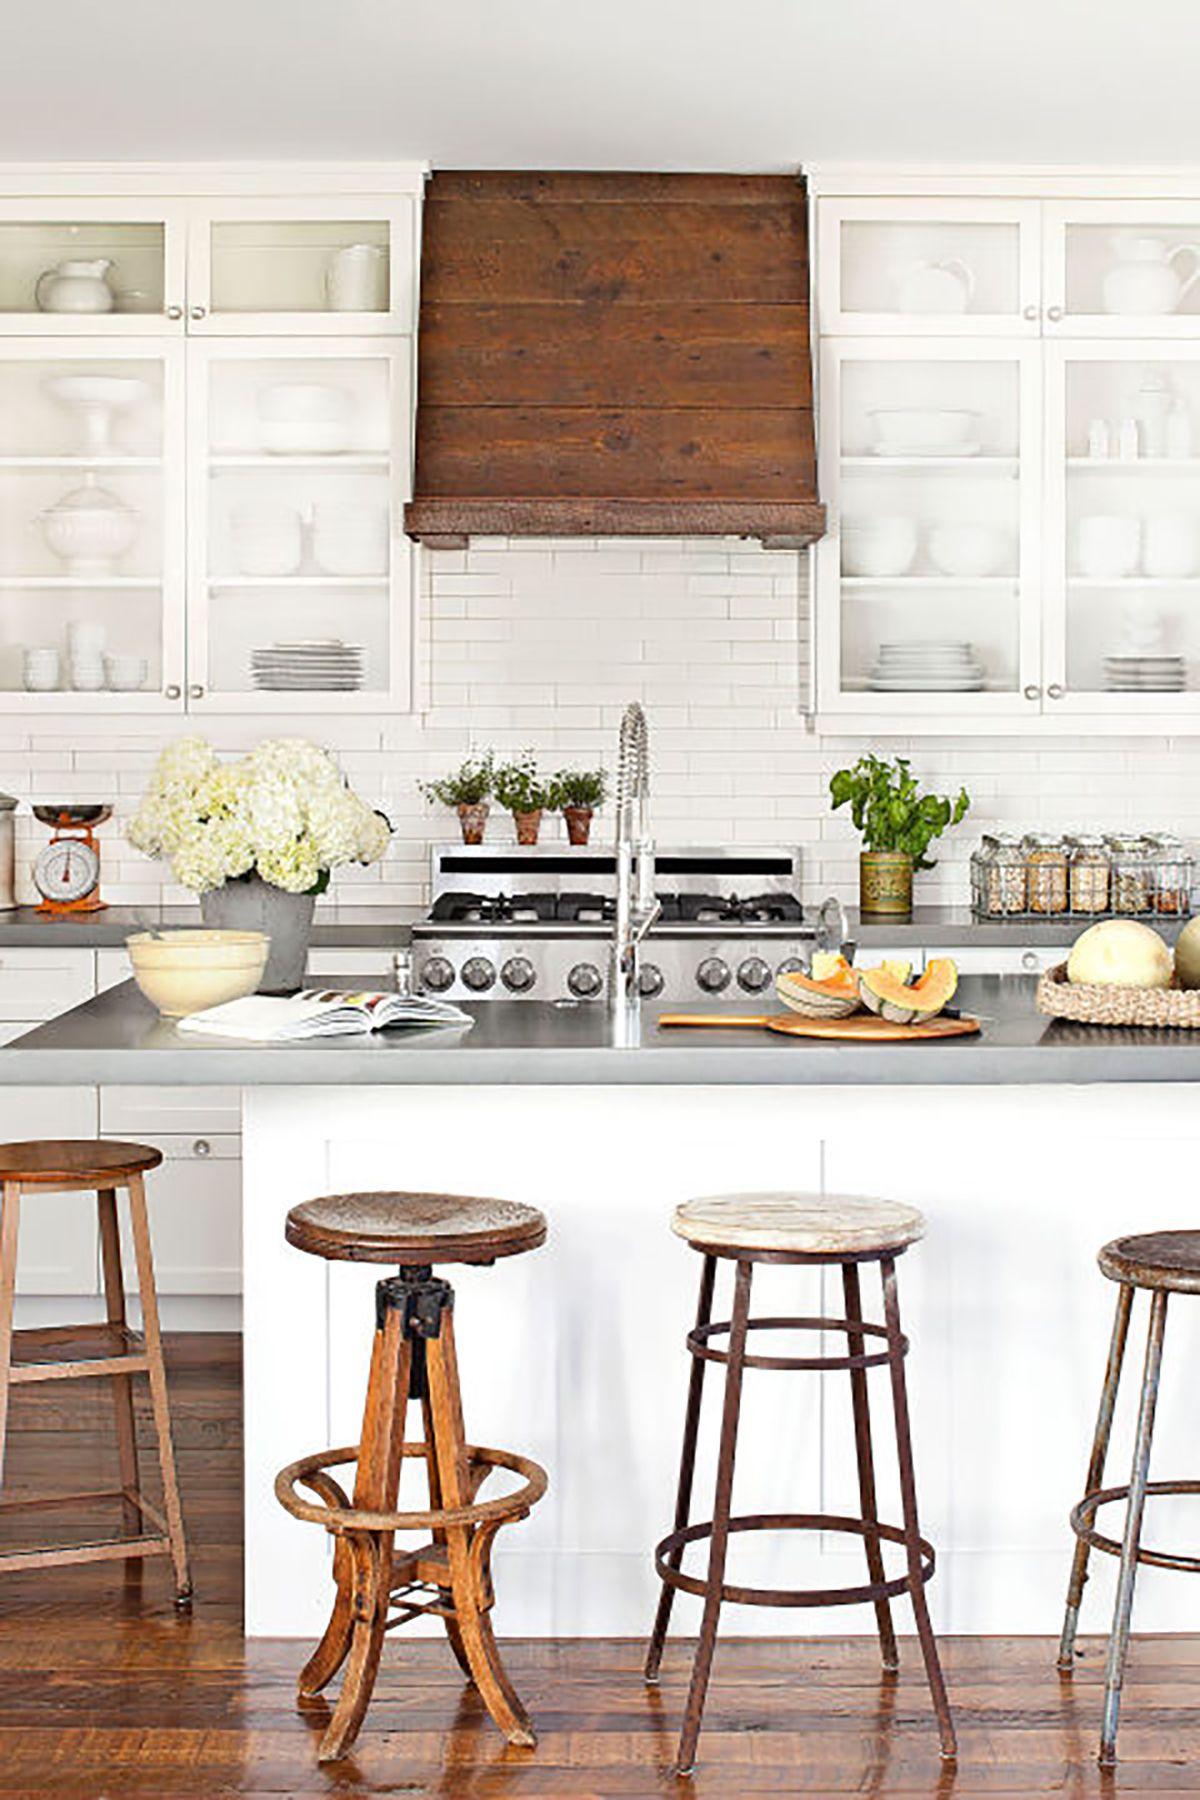 Rustic Country Kitchen Decor 18 farmhouse style kitchens - rustic decor ideas for kitchens